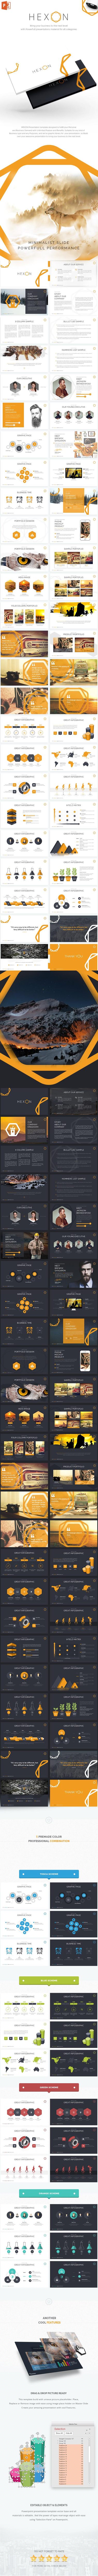 Hexon - Powerpoint Template - Creative PowerPoint Templates